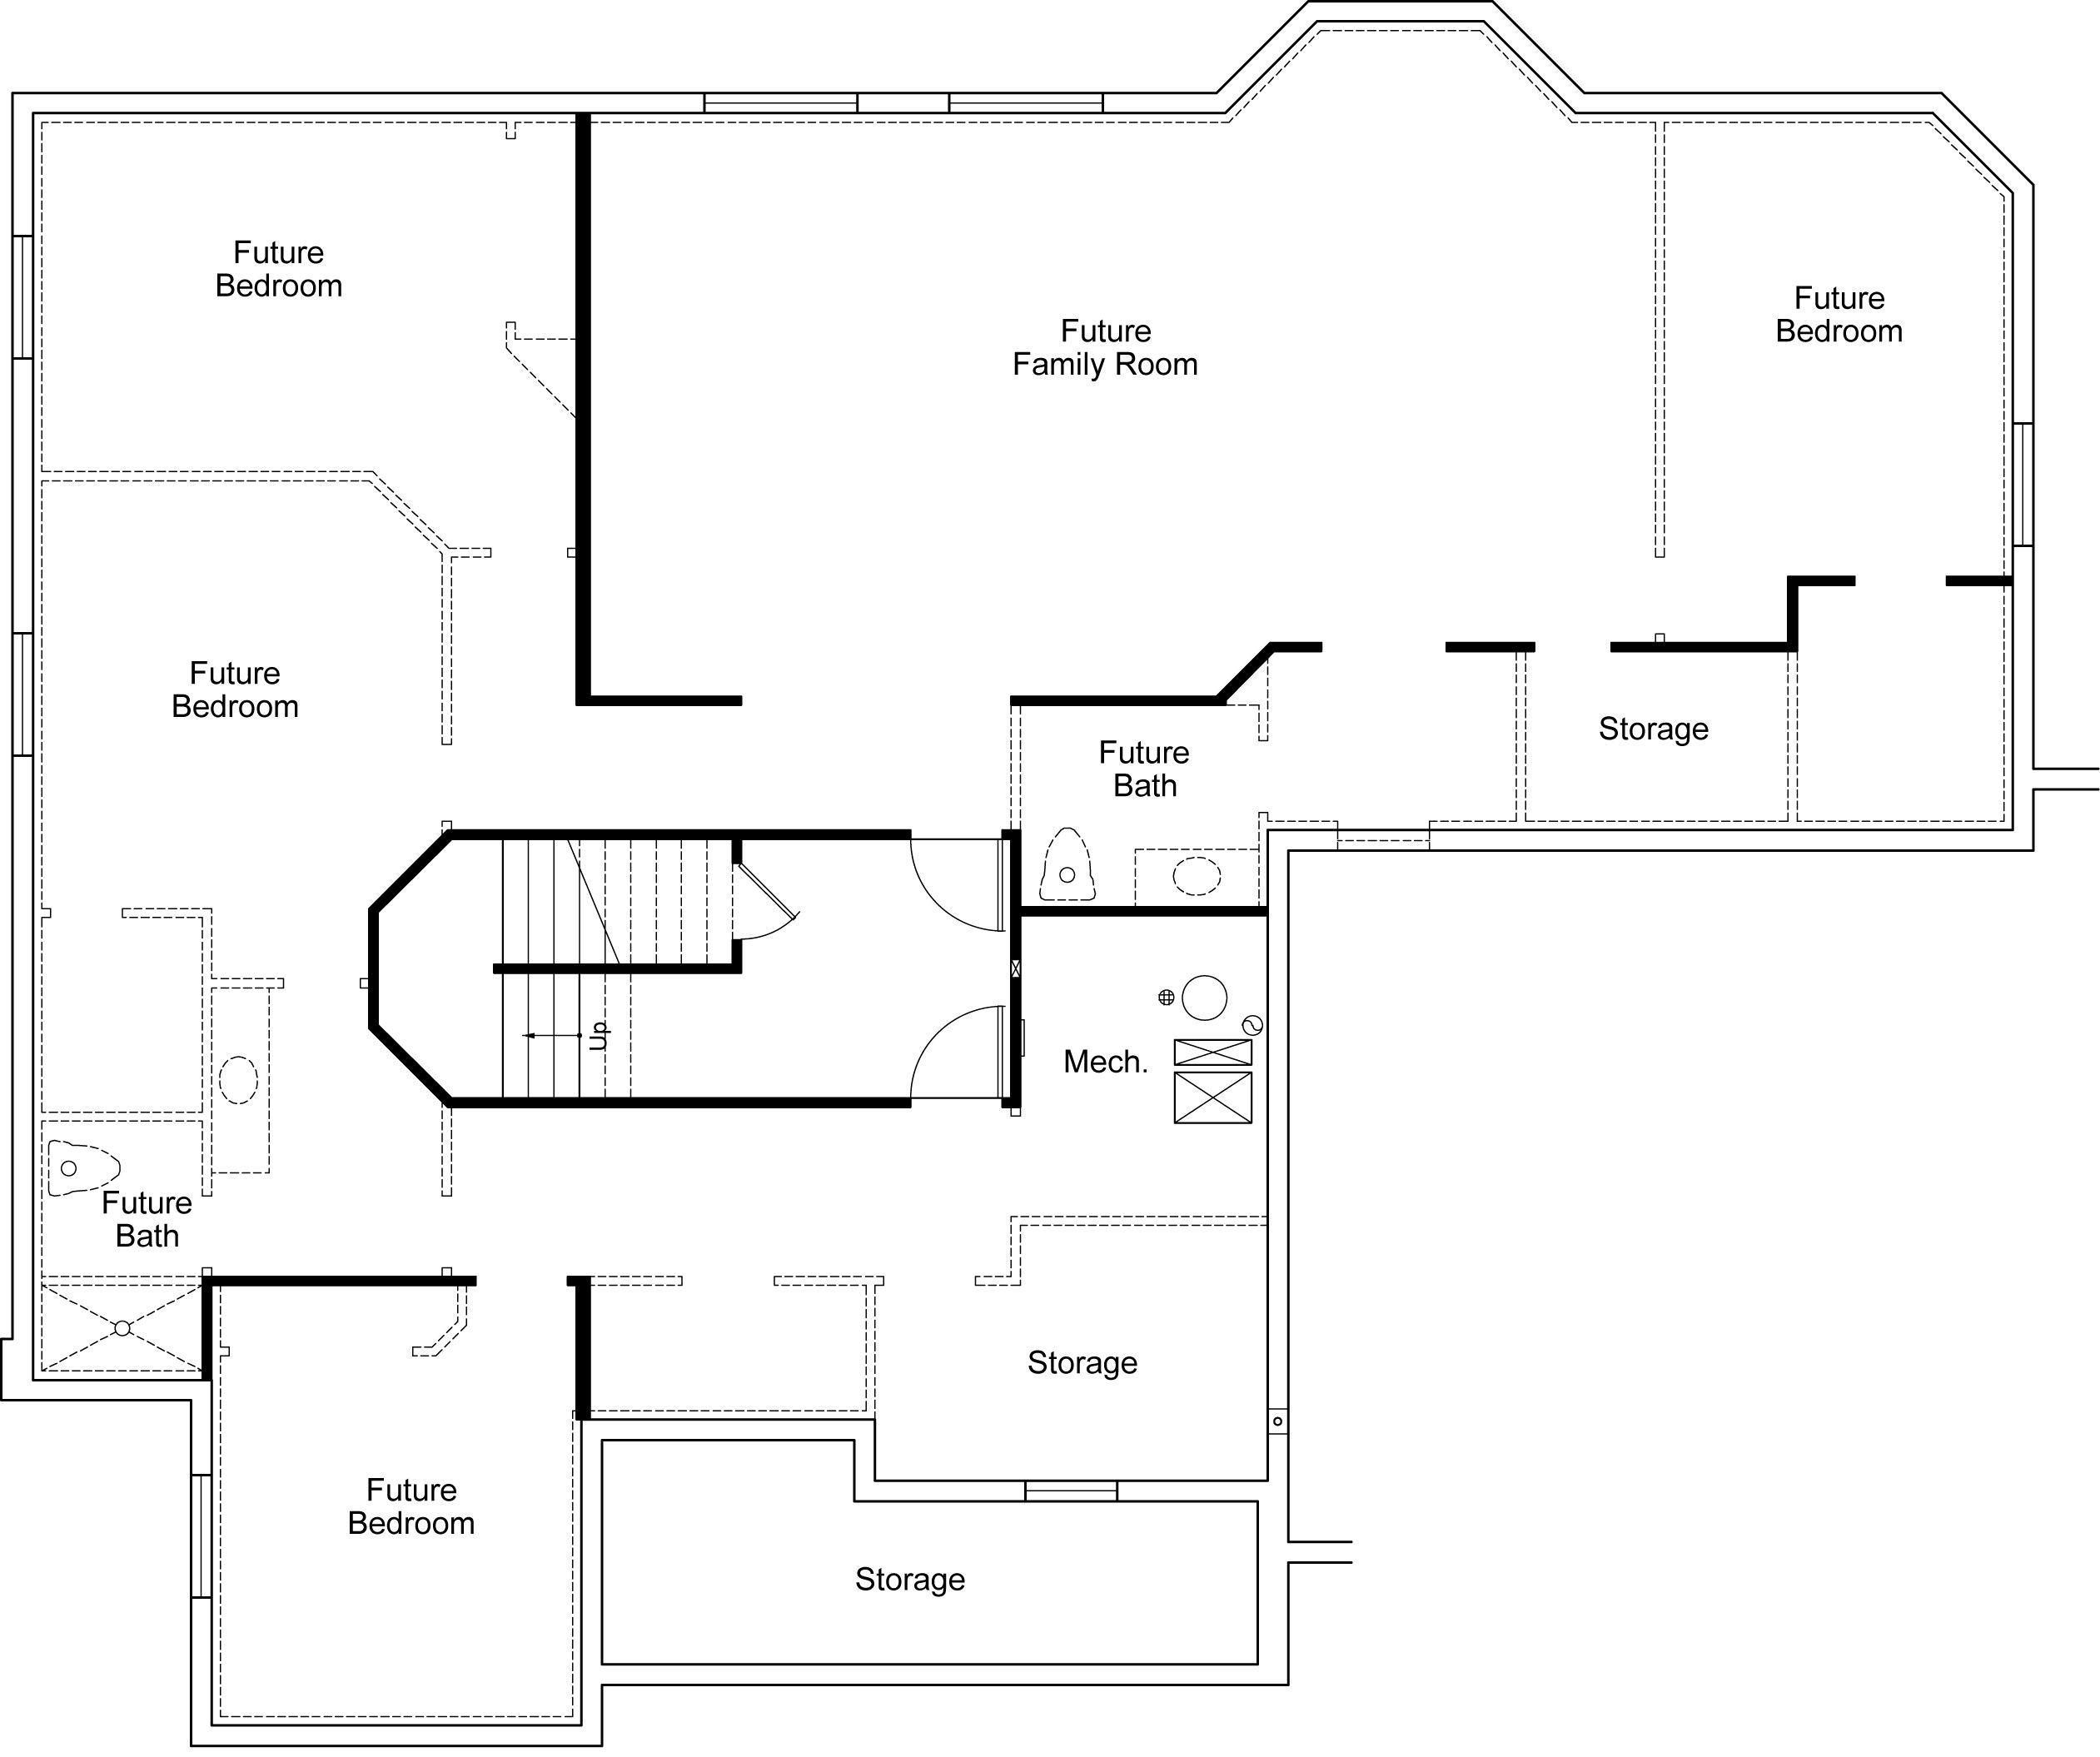 Bella Vista Ivory Homes Floor Plan Basement Level Home Design